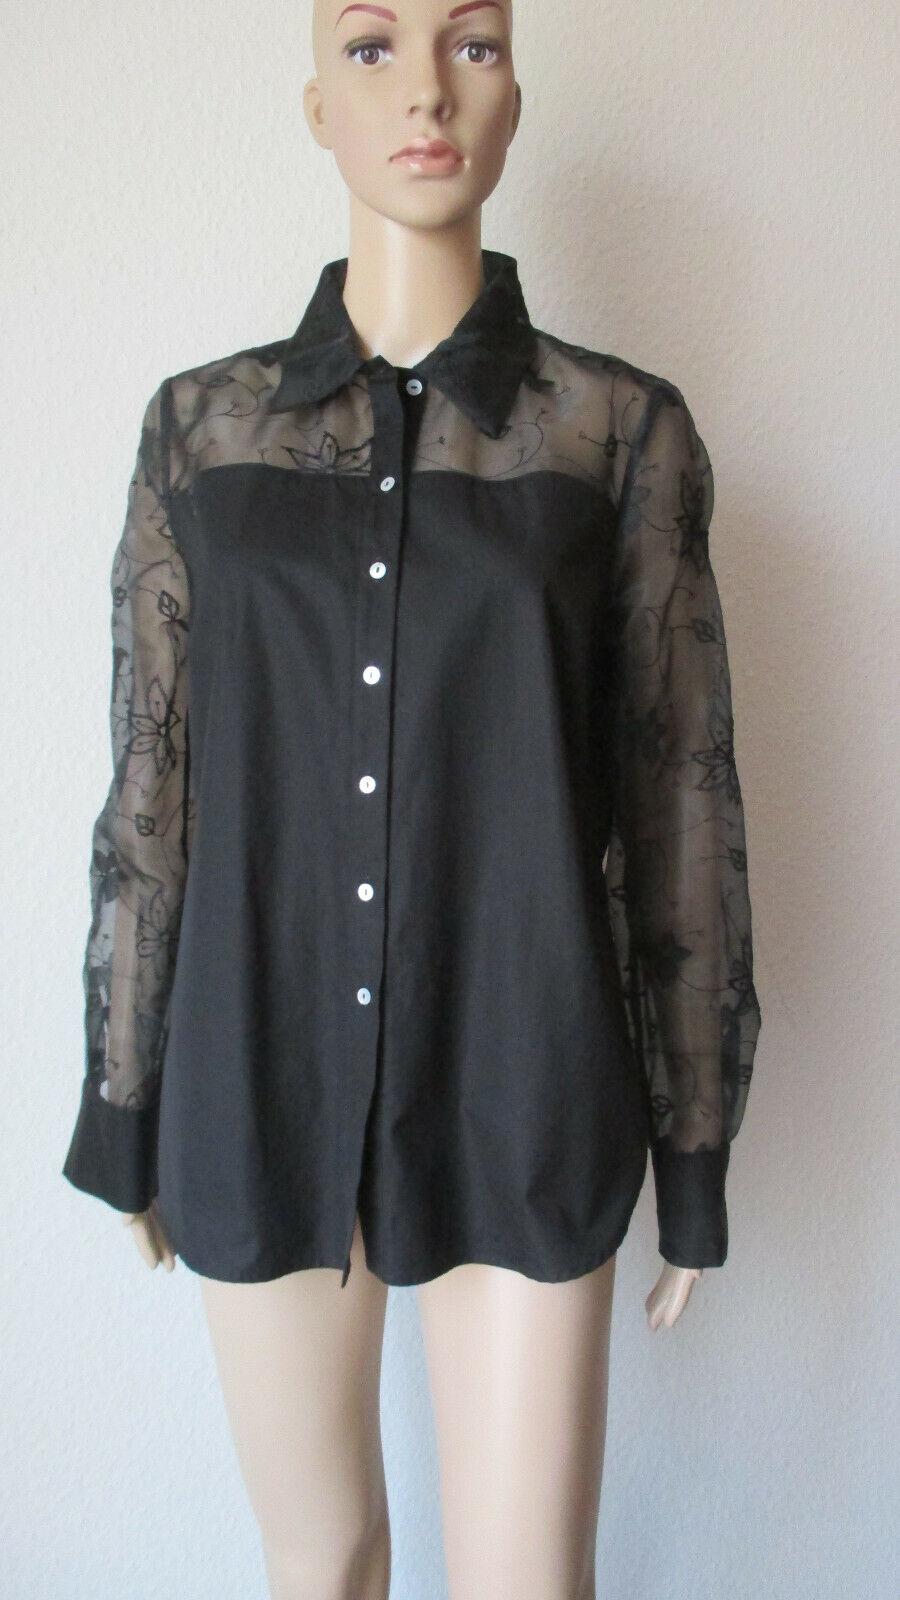 B. M. Company edle, schwarze Blause, Ärmel aus Organdi, Größe 40